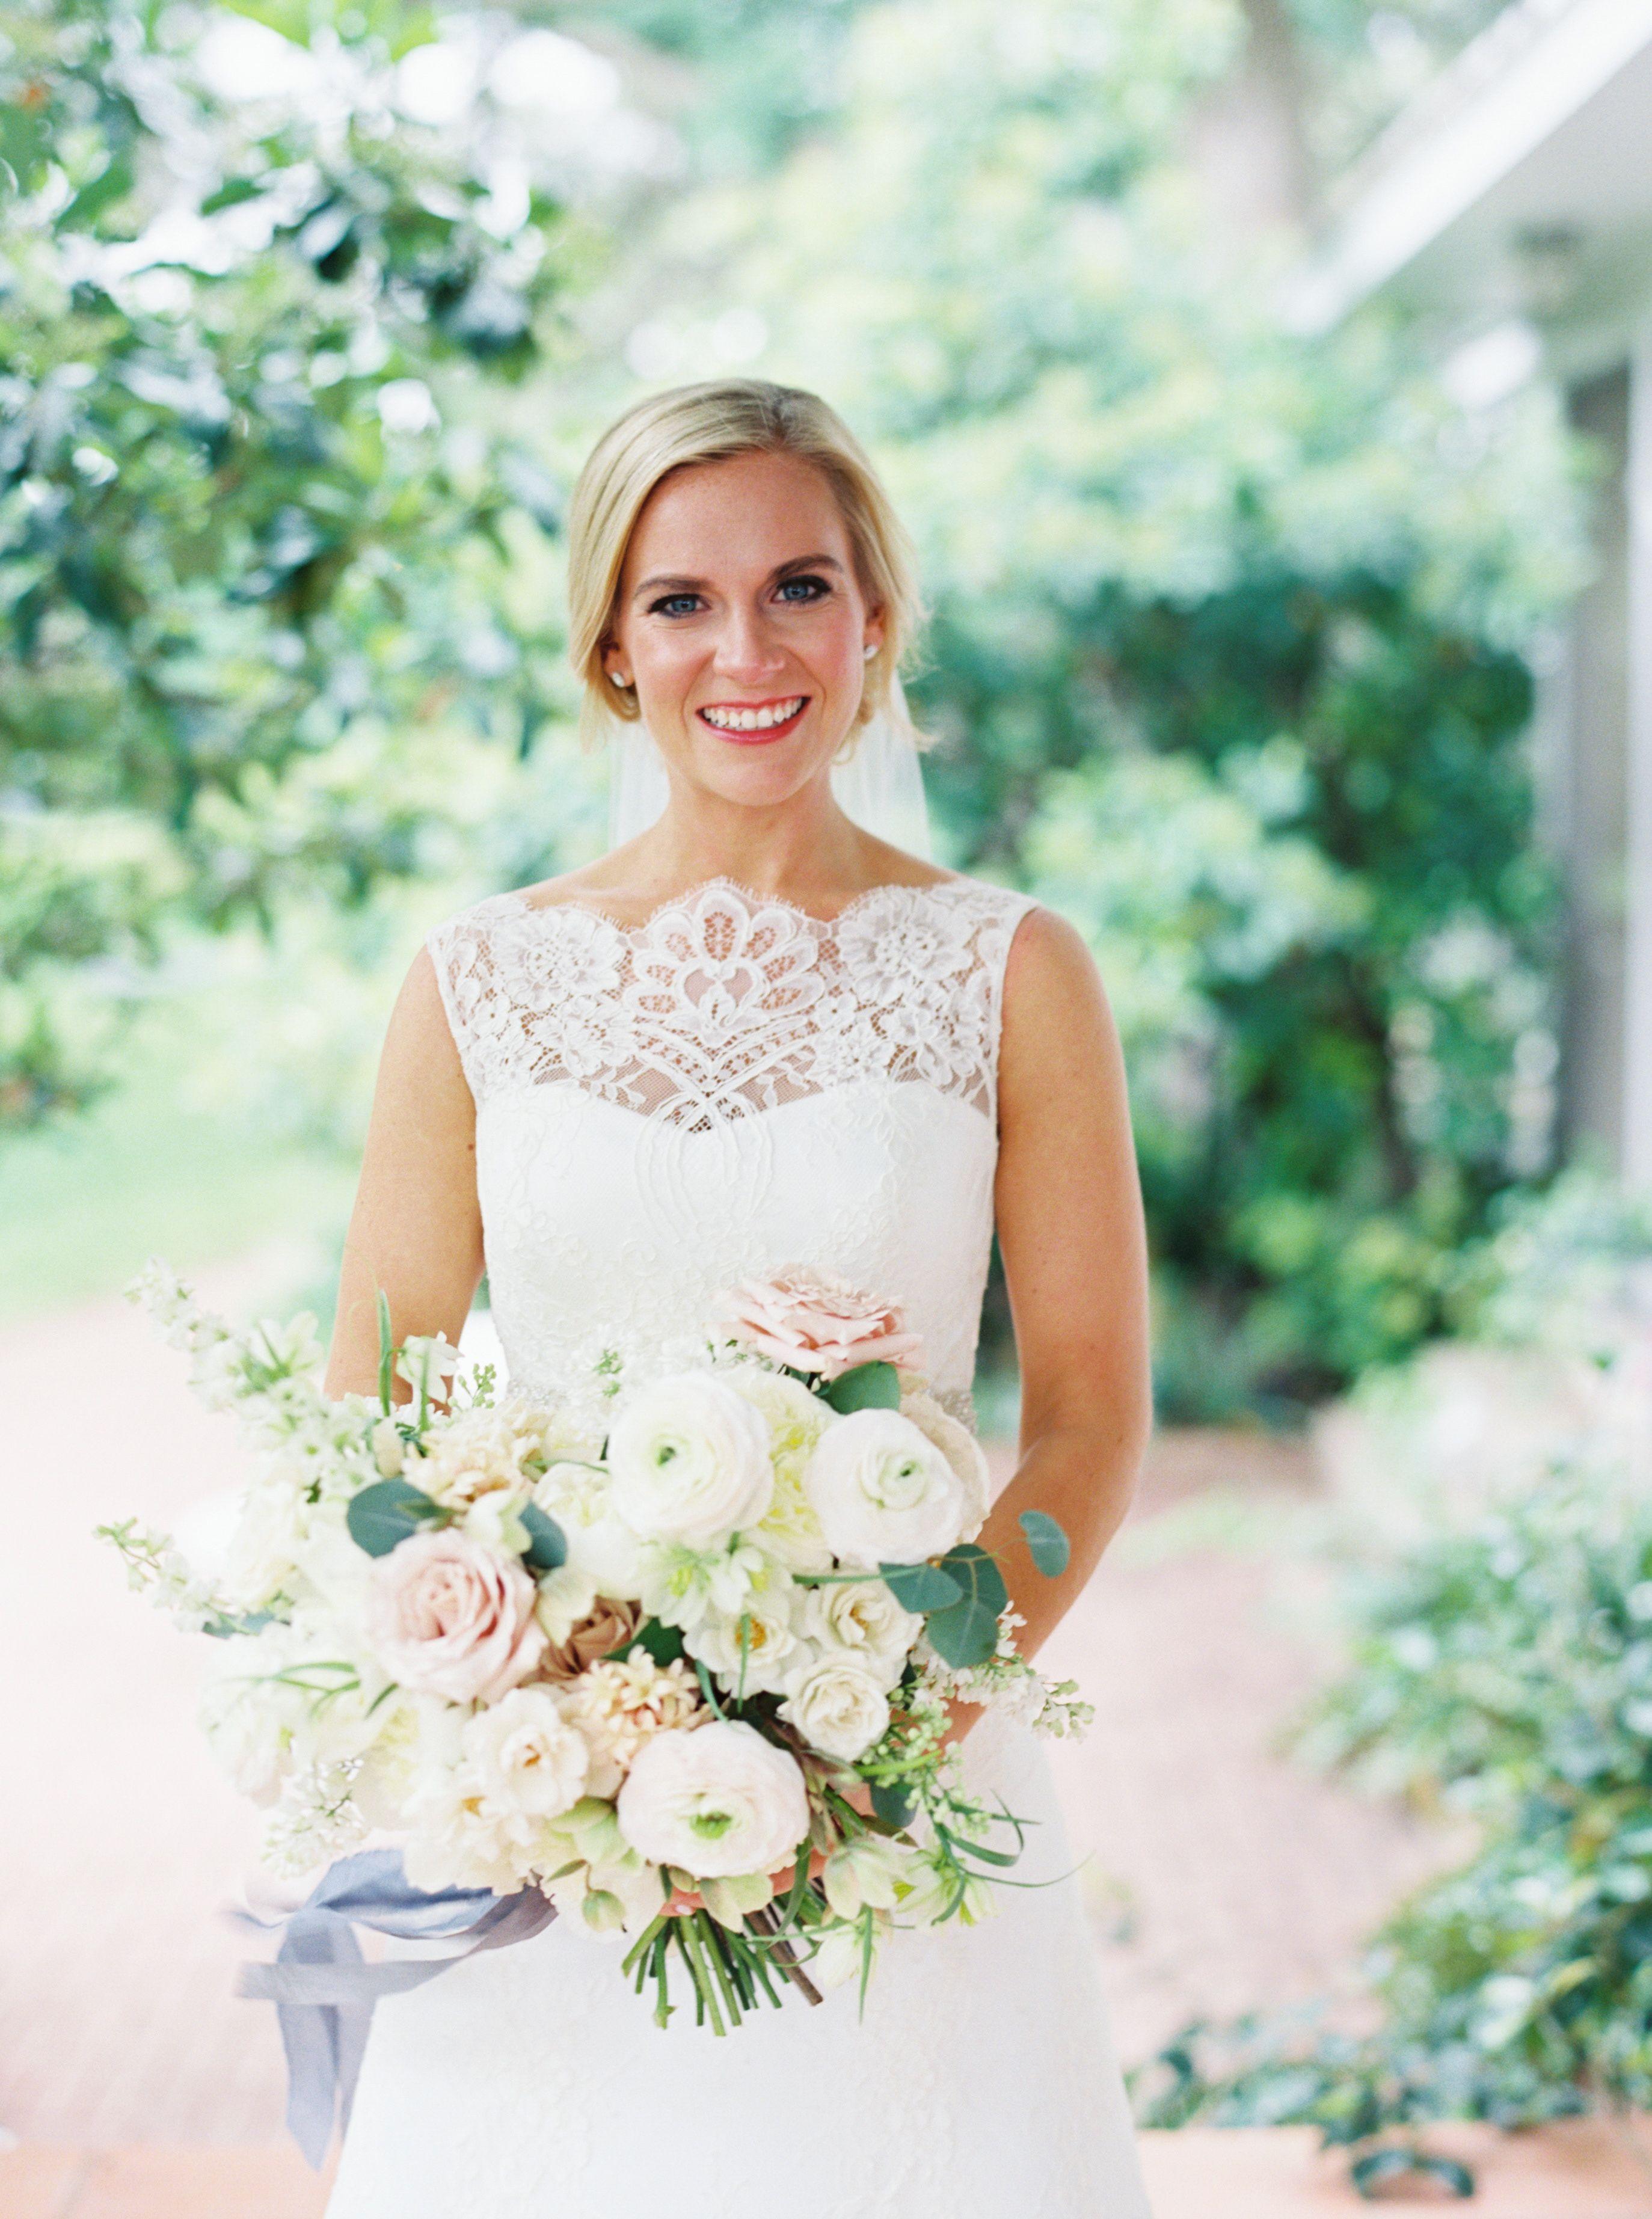 Green and white wedding dress  Lush Garden Wedding With Greens Galore  Lush garden LUSH and Florals